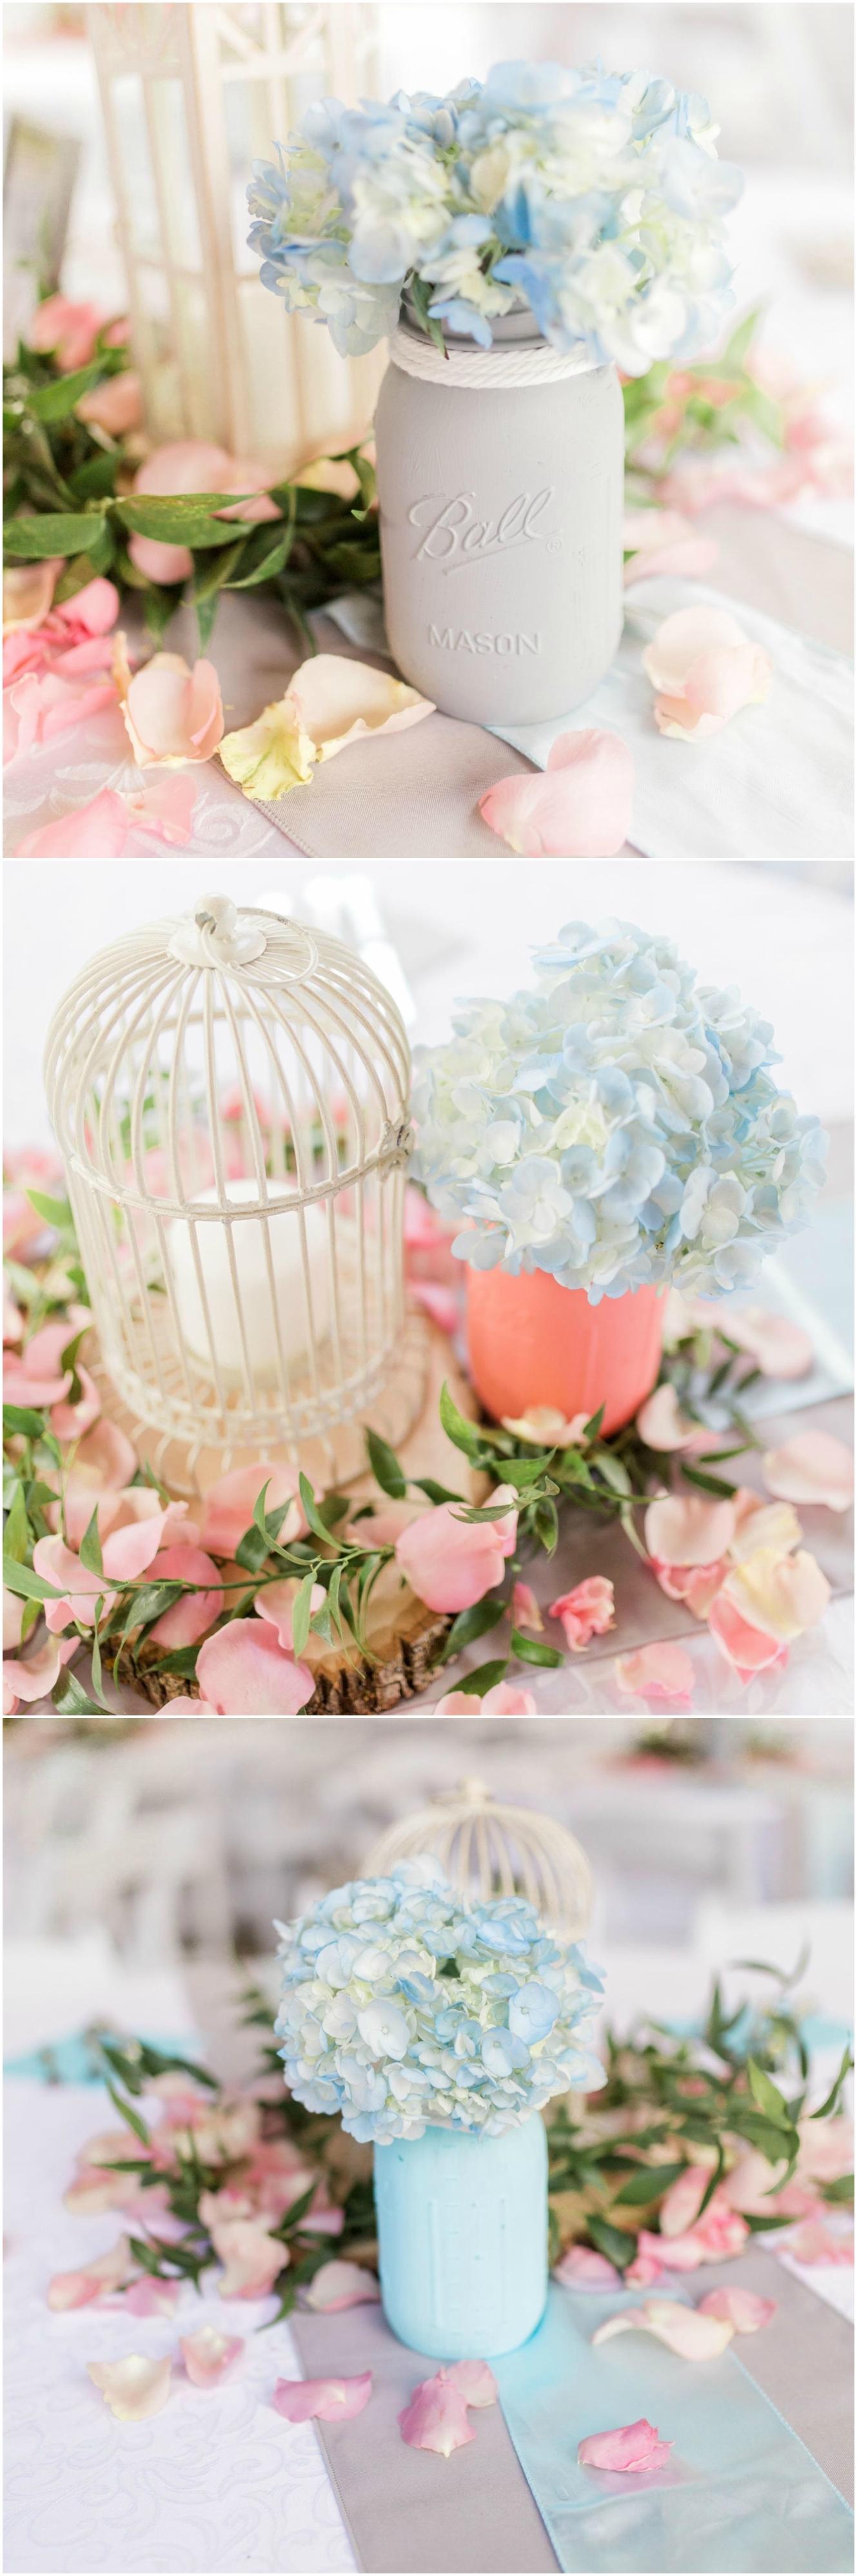 Weddingcenterpieces, painted mason jars, white birdcage, blue hydrangeas, pink rose petals // Jyn Allen Photography